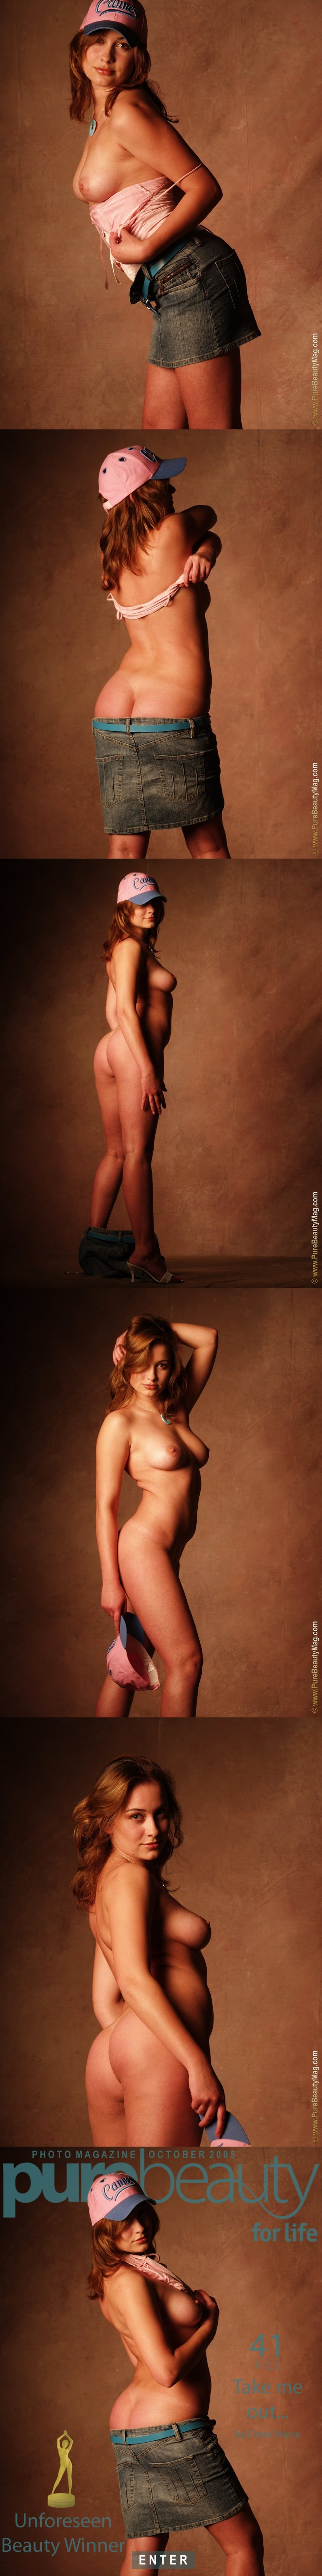 PureBeautyMag PBM  - 2005-10-25 -  s136881 - Hana Vesela - Take me out - 2560px